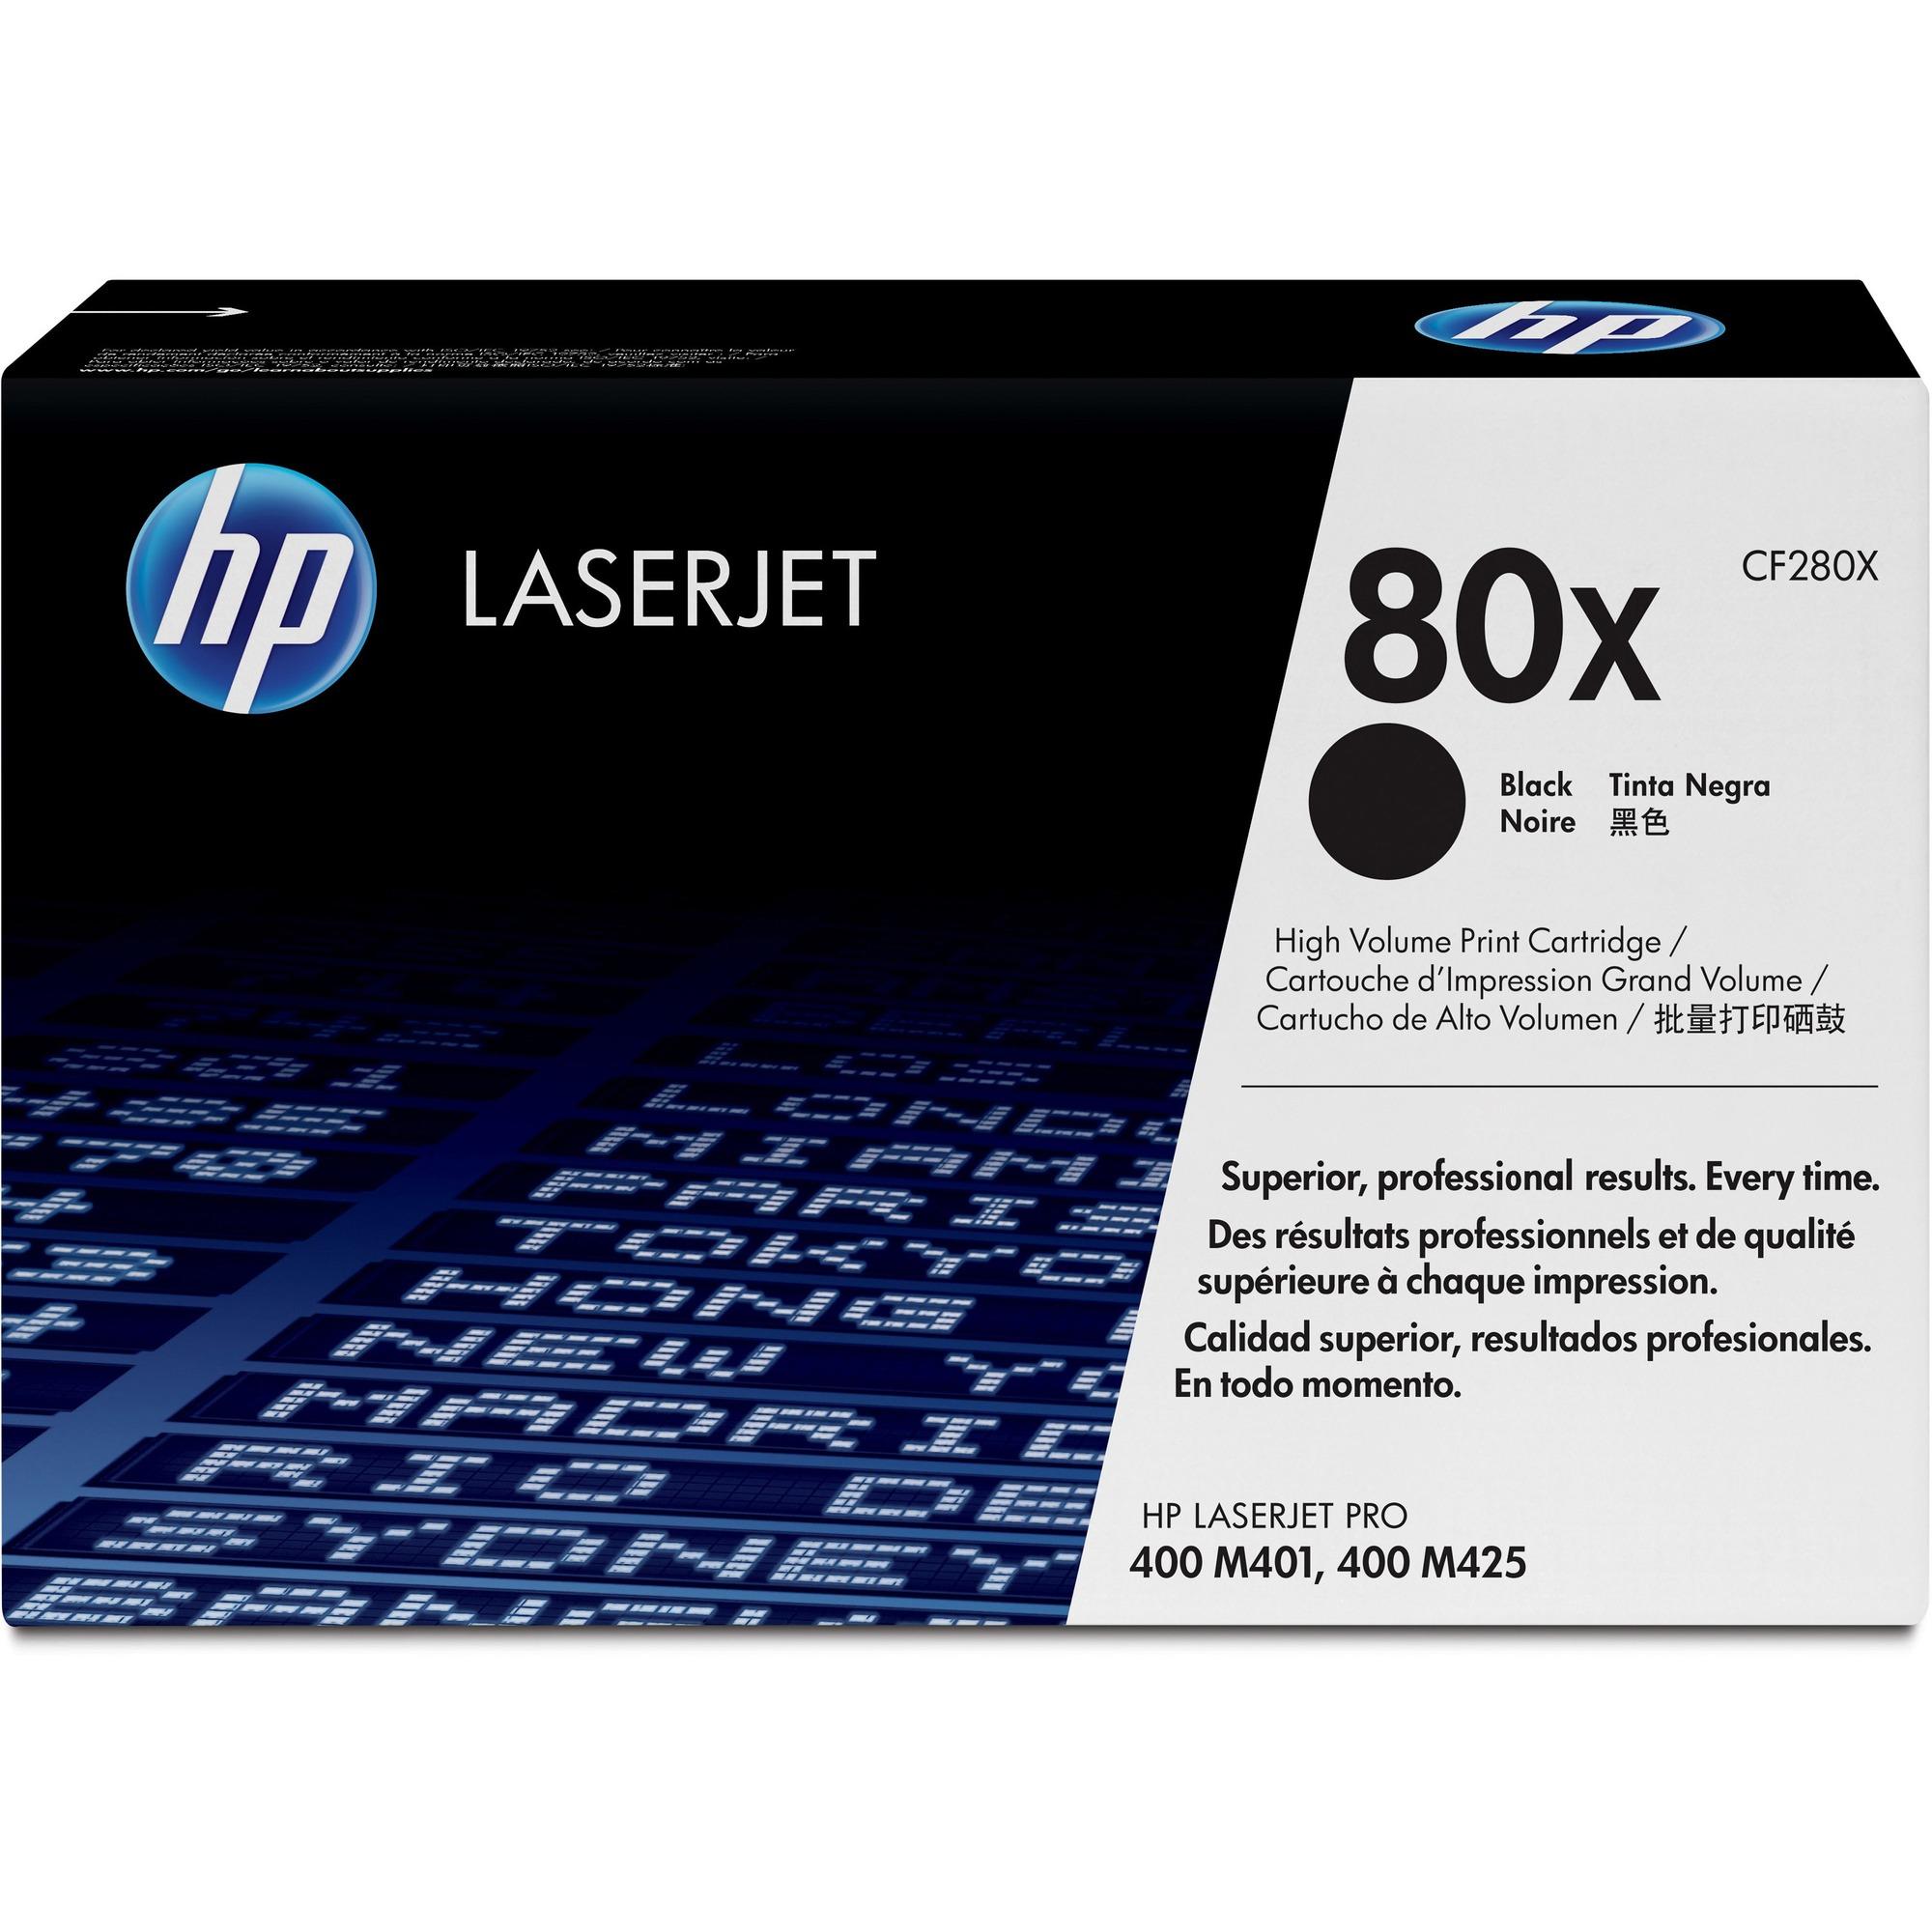 HP 80X Toner Cartridge - Black - Laser - 6900 Page - 1 Pack